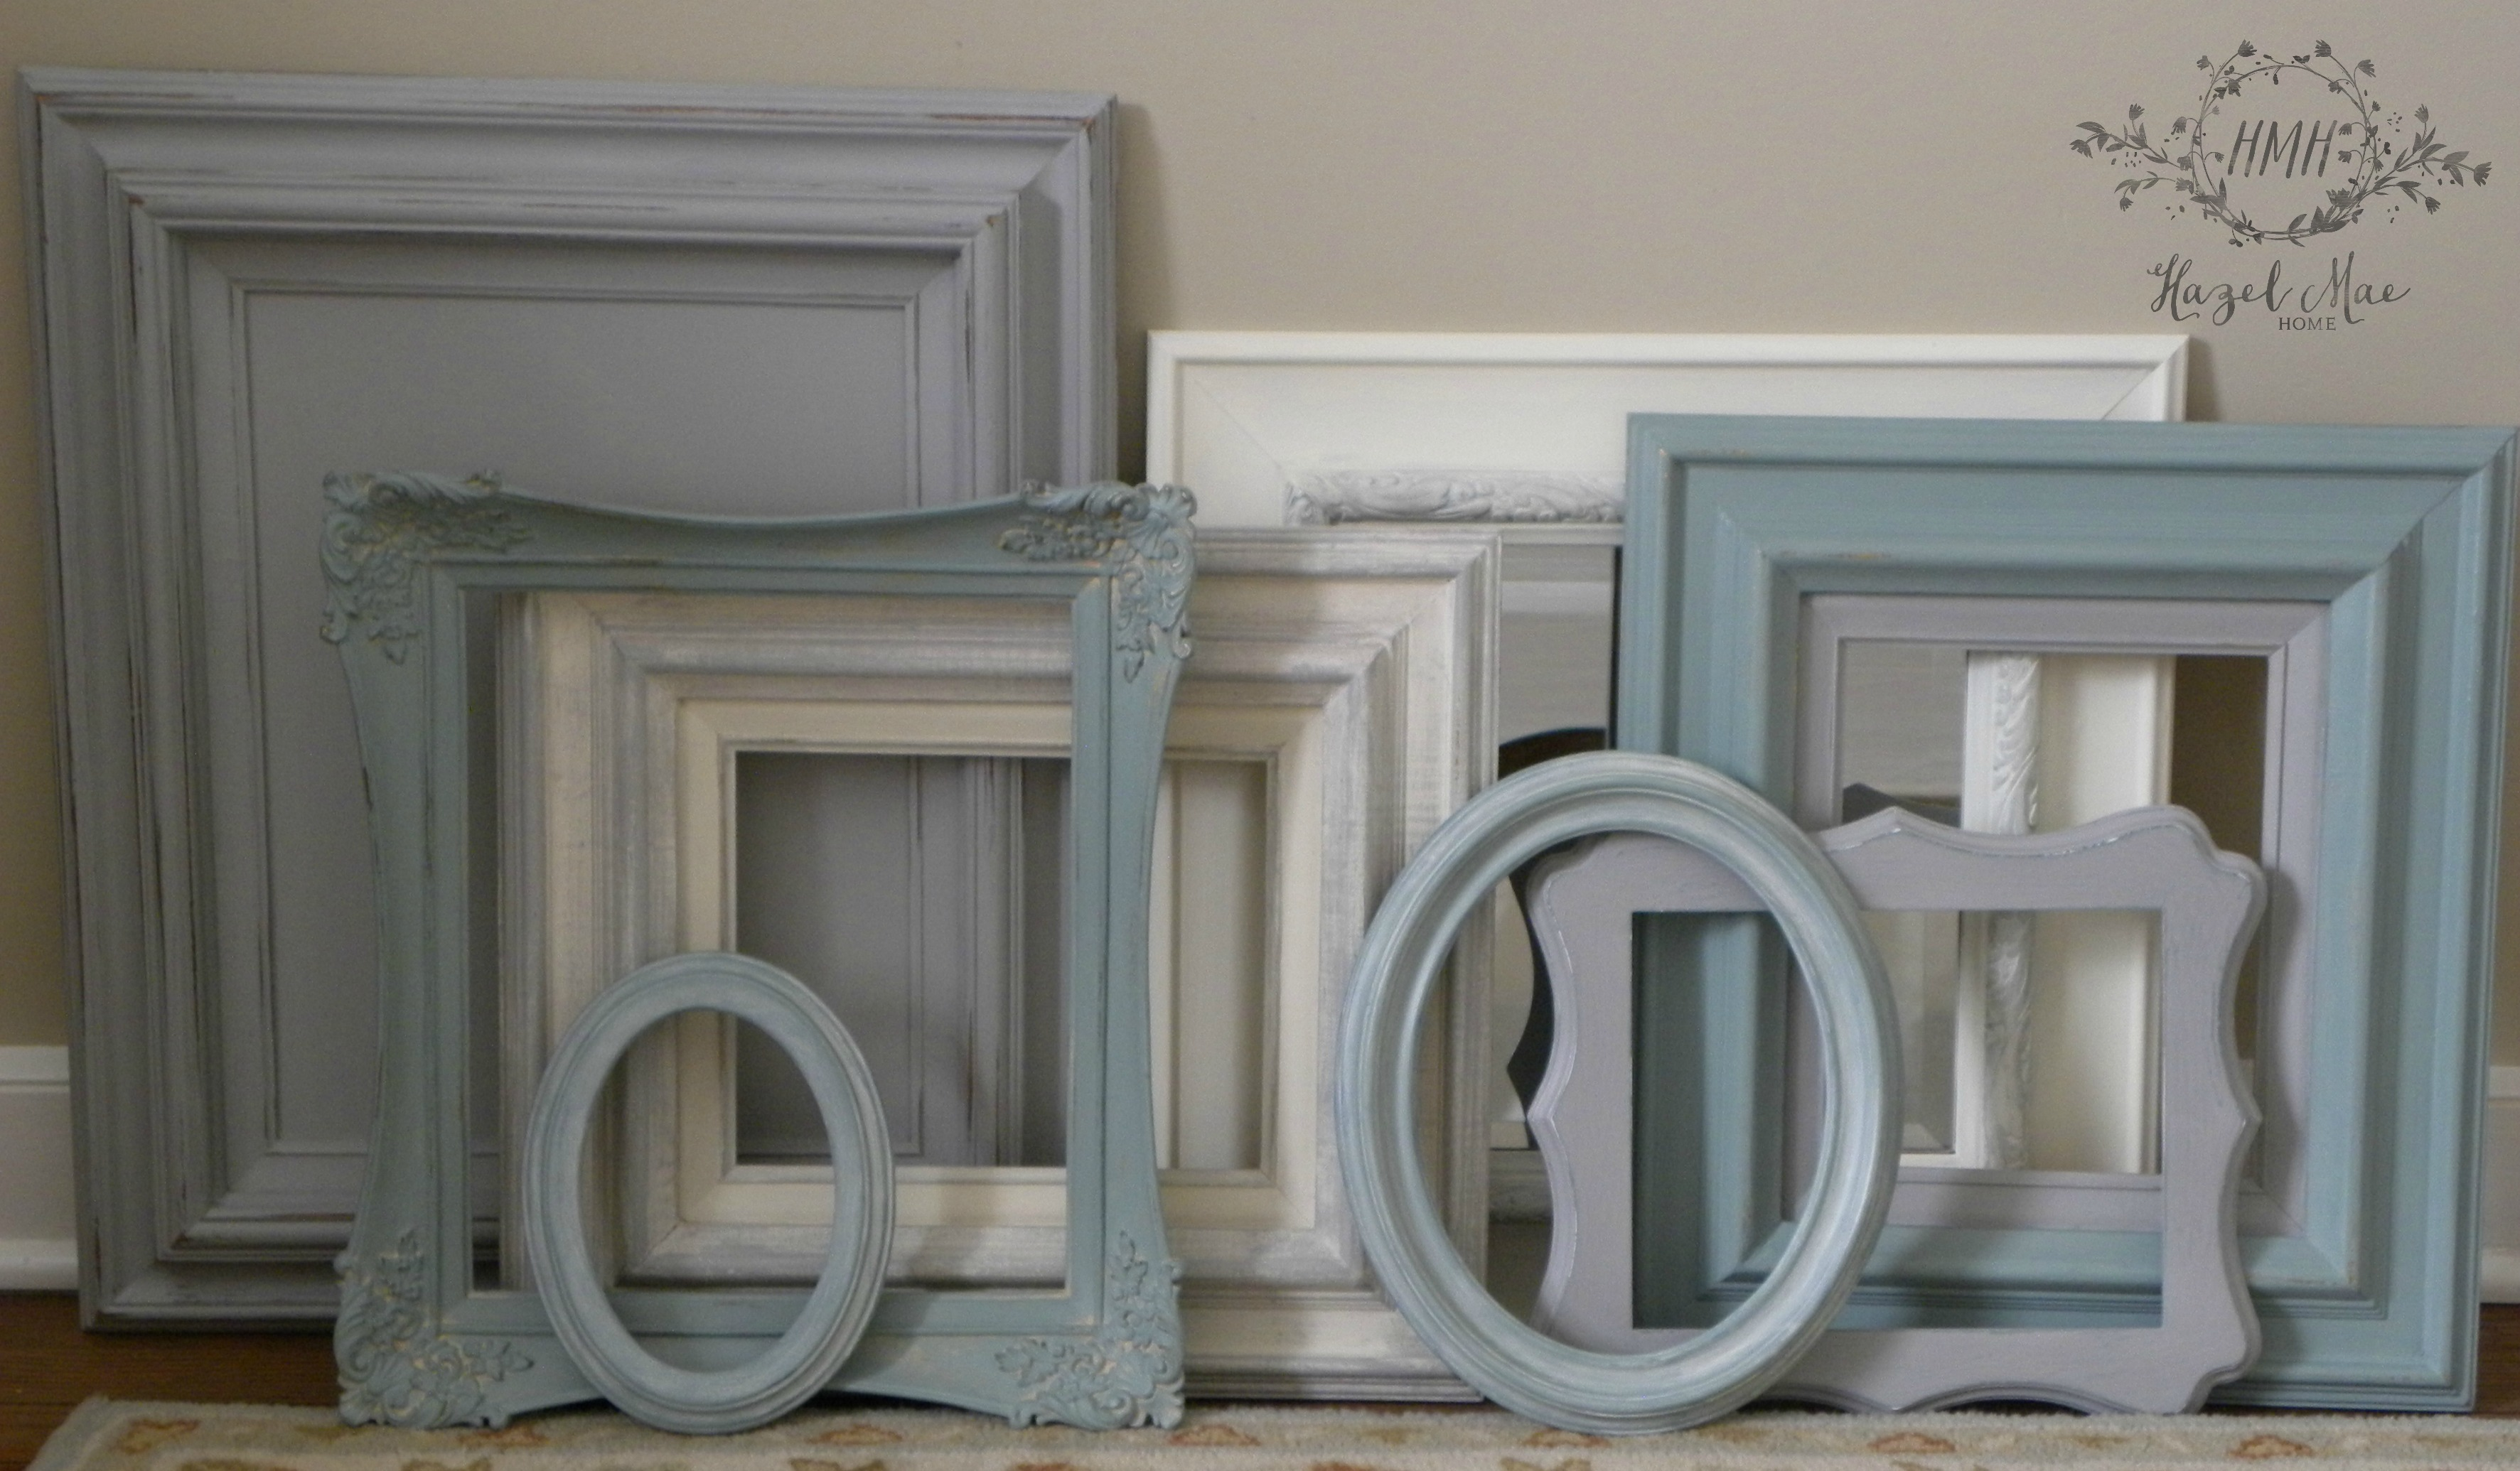 Bedroom wall gallery hazel mae home for Bedroom wall frames